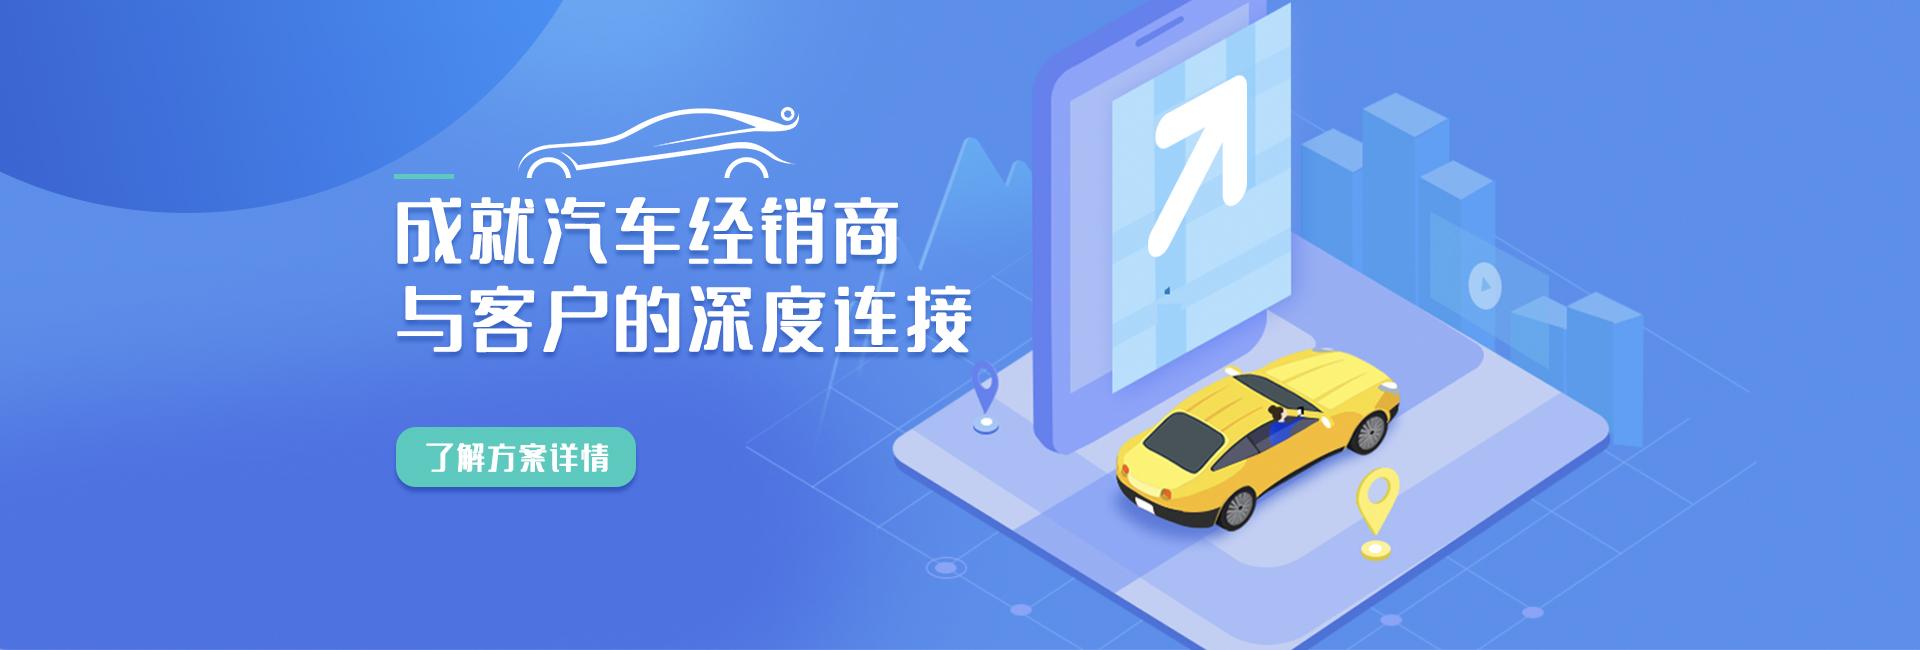 car solutions pcbanner